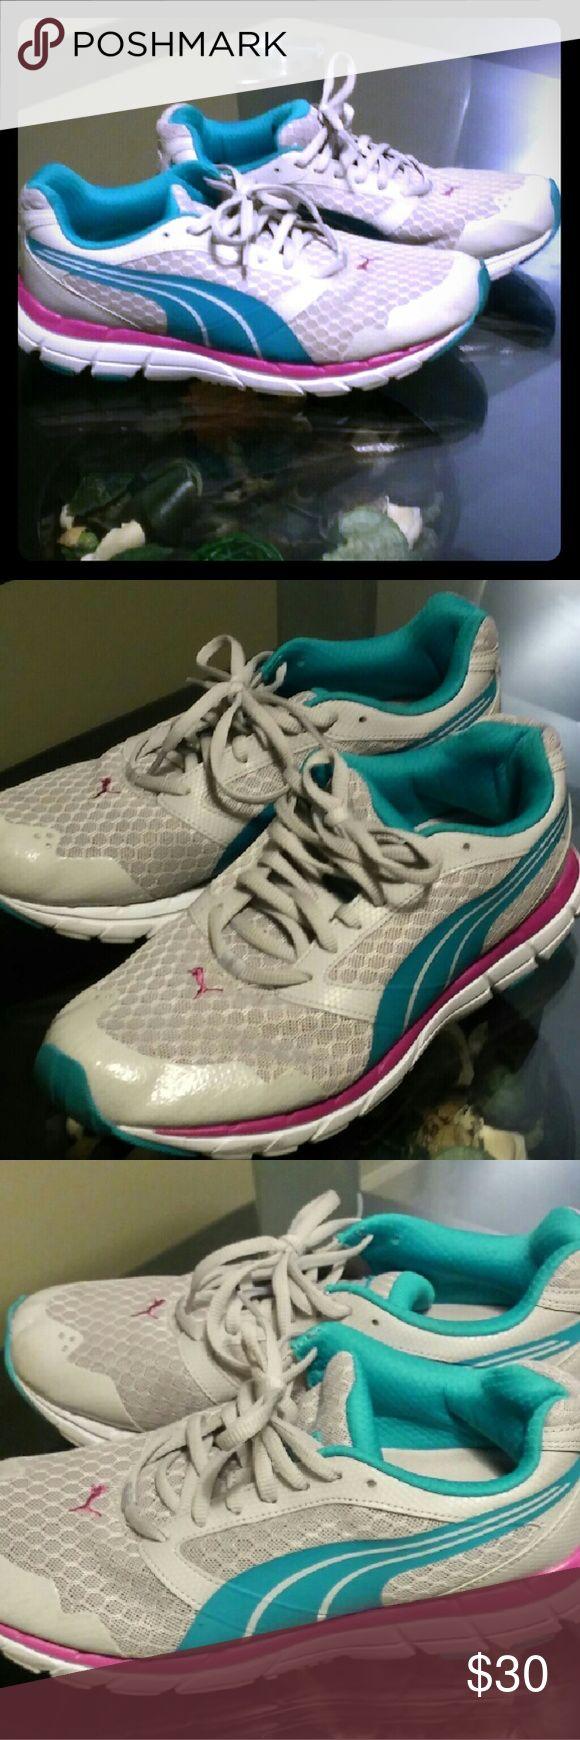 Puma sneakers Women's comfortable puma sneakers size 8 Puma Shoes Sneakers